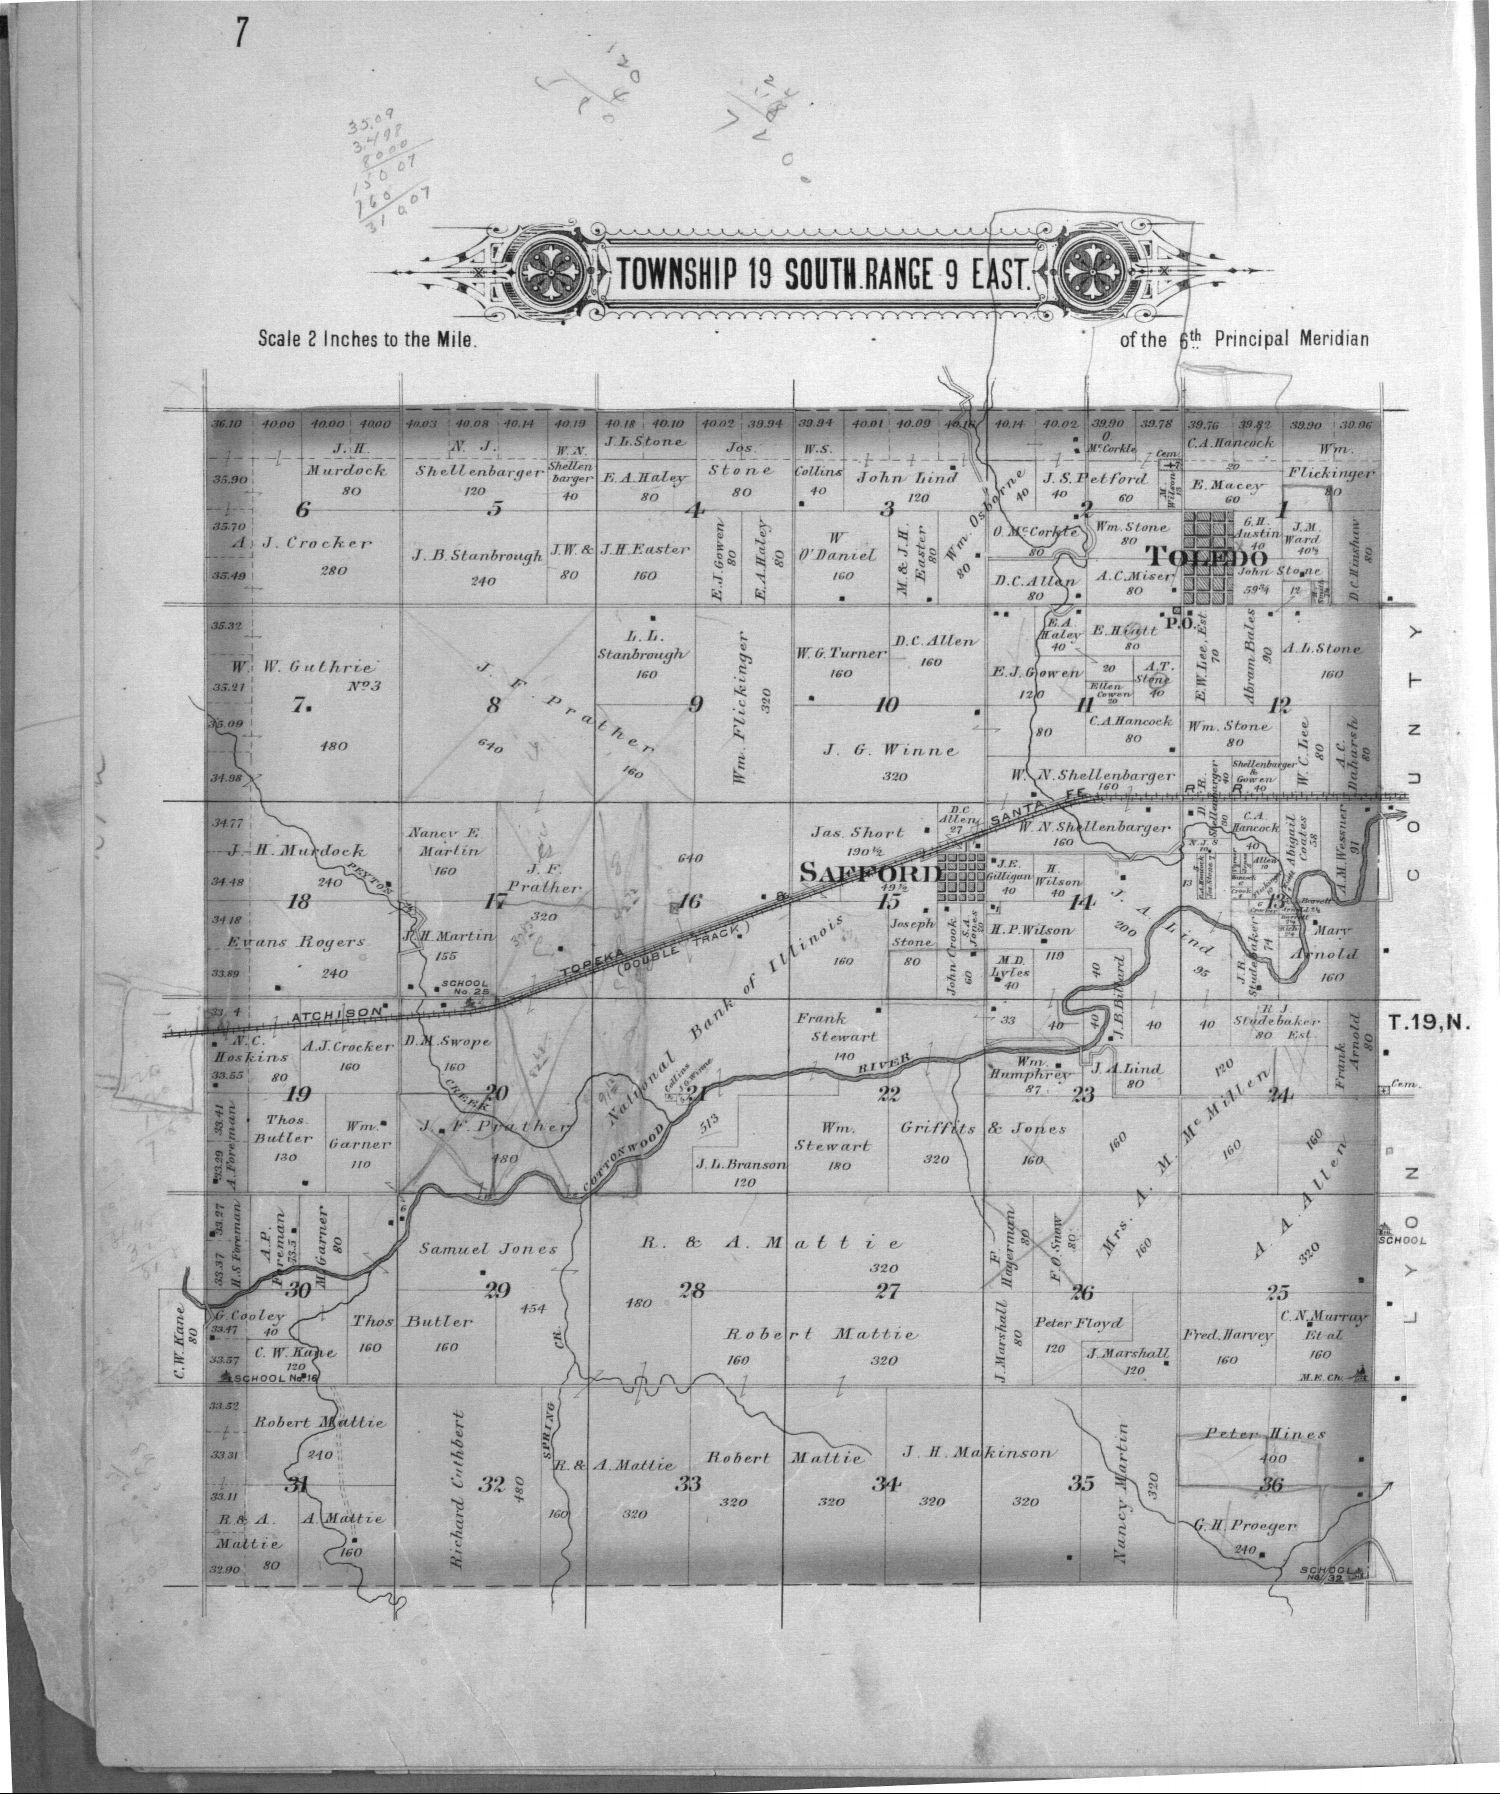 Plat book, Chase County, Kansas - 7